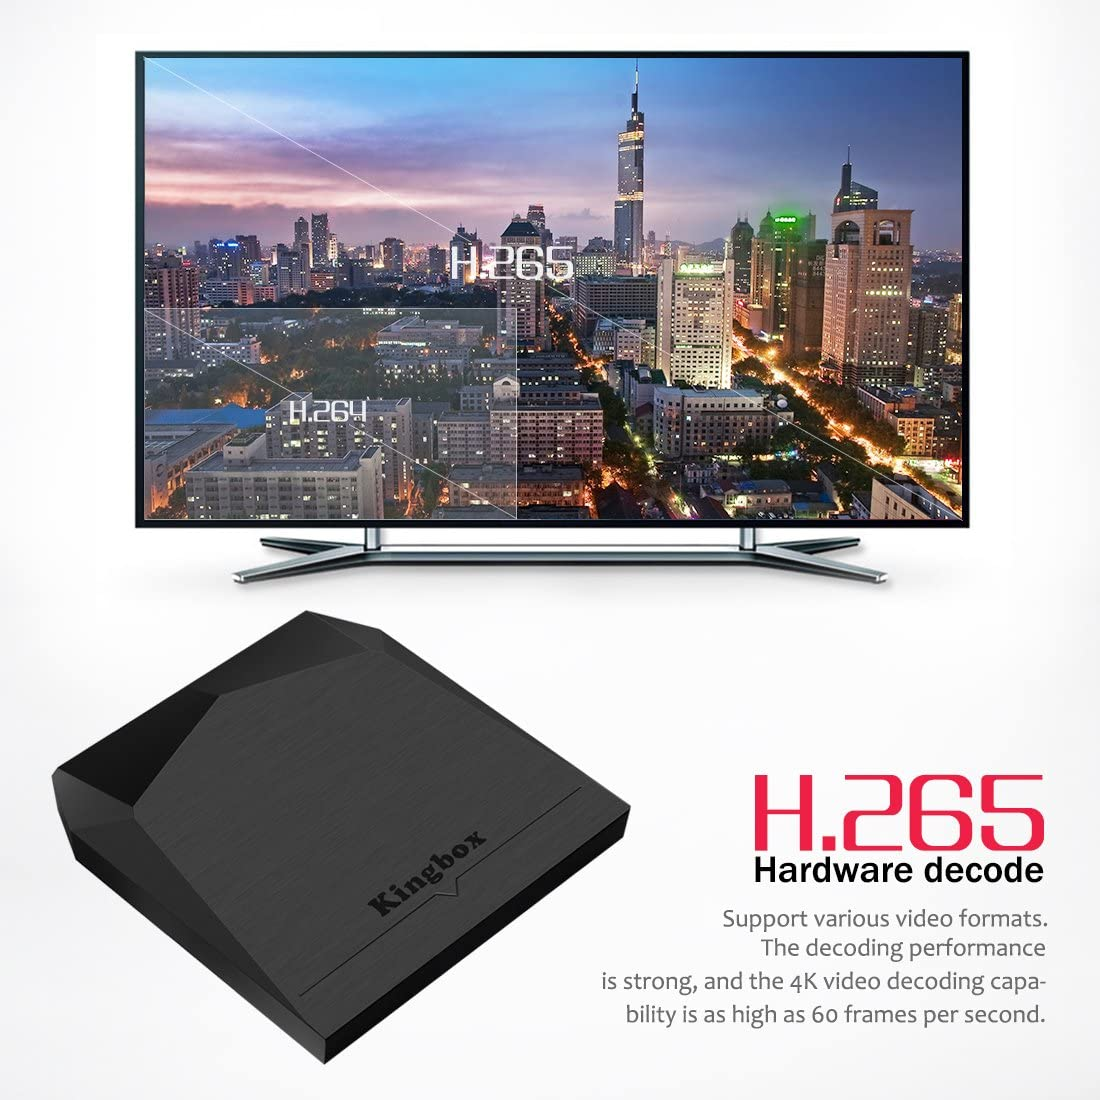 Kingbox Android TV Box, K3 Android 7.1 Box con Amlogic S912 Octa-Core 64 bits 2 GB/16 GB Soporte Dual WiFi 2.4 + 5 GHz/BT 4.0/4 K / 3 D / 1000 M LAN Android Smart TV Box: Amazon.es: Electrónica